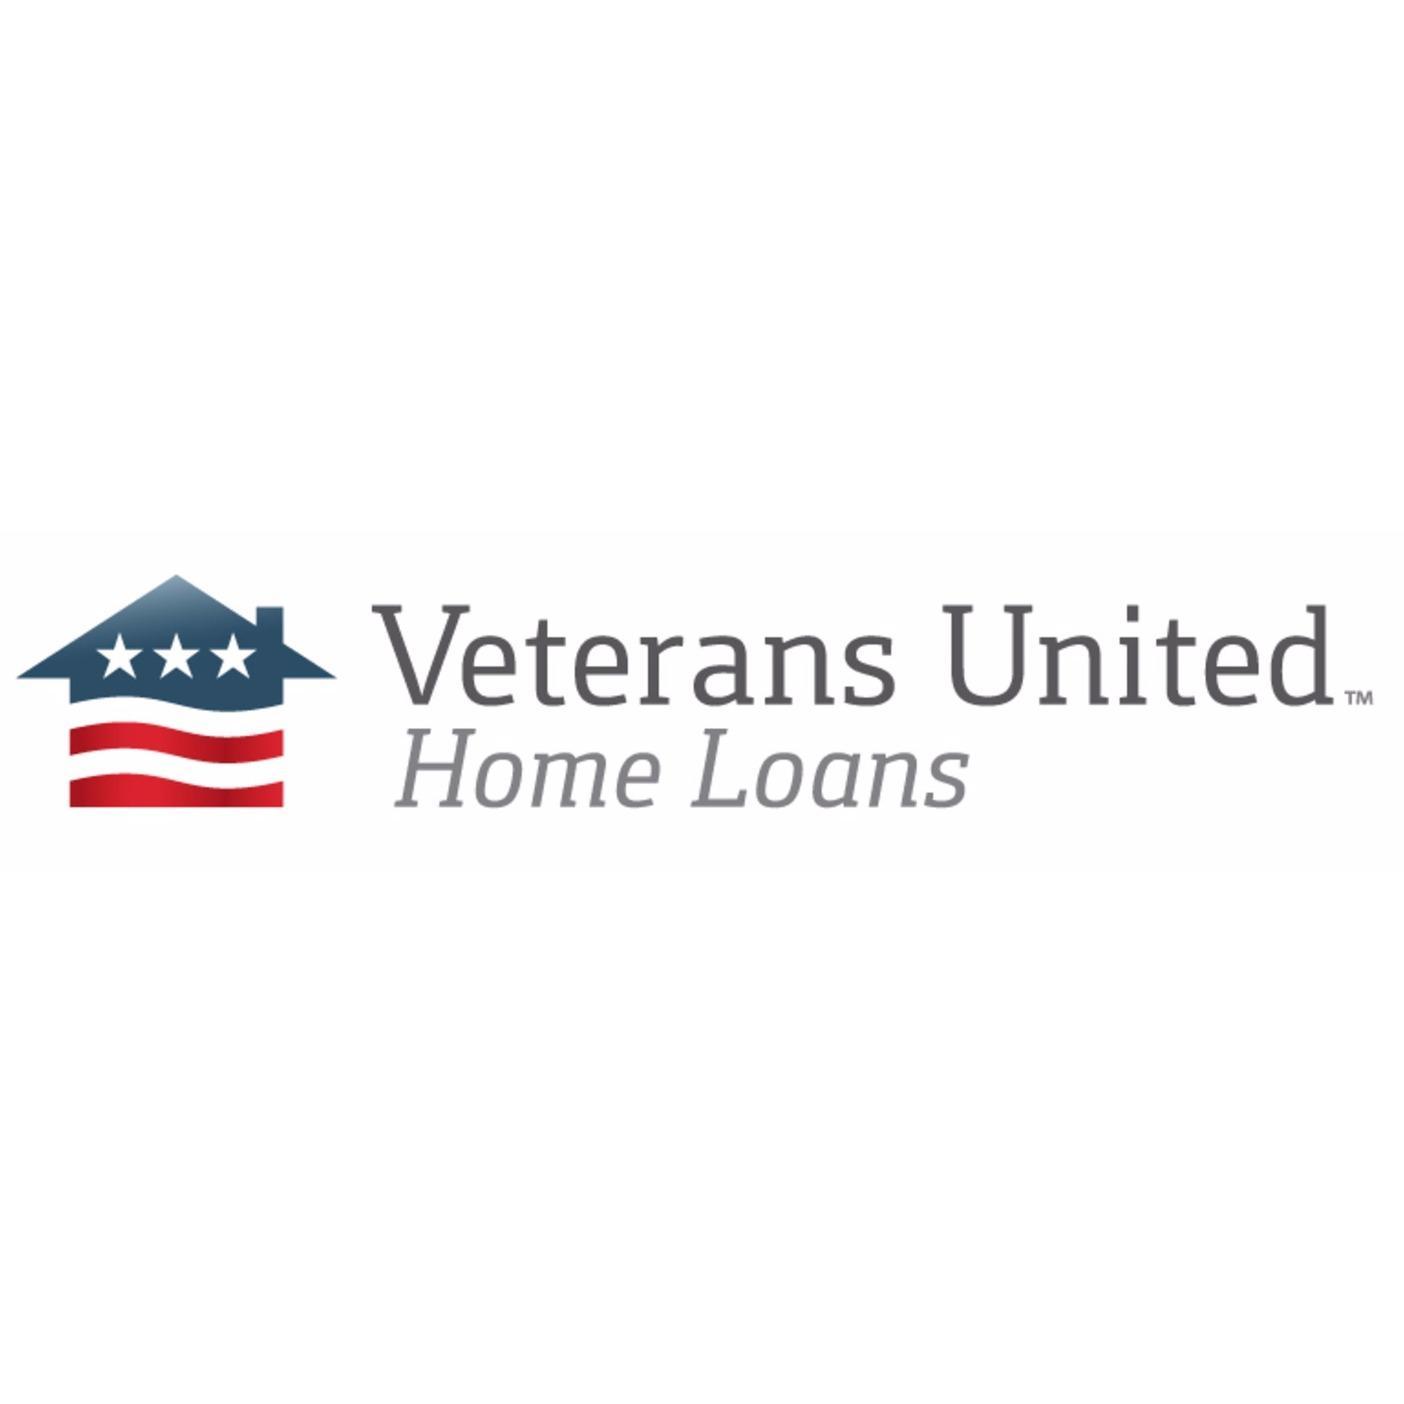 Kevin Warren at Veterans United Home Loans